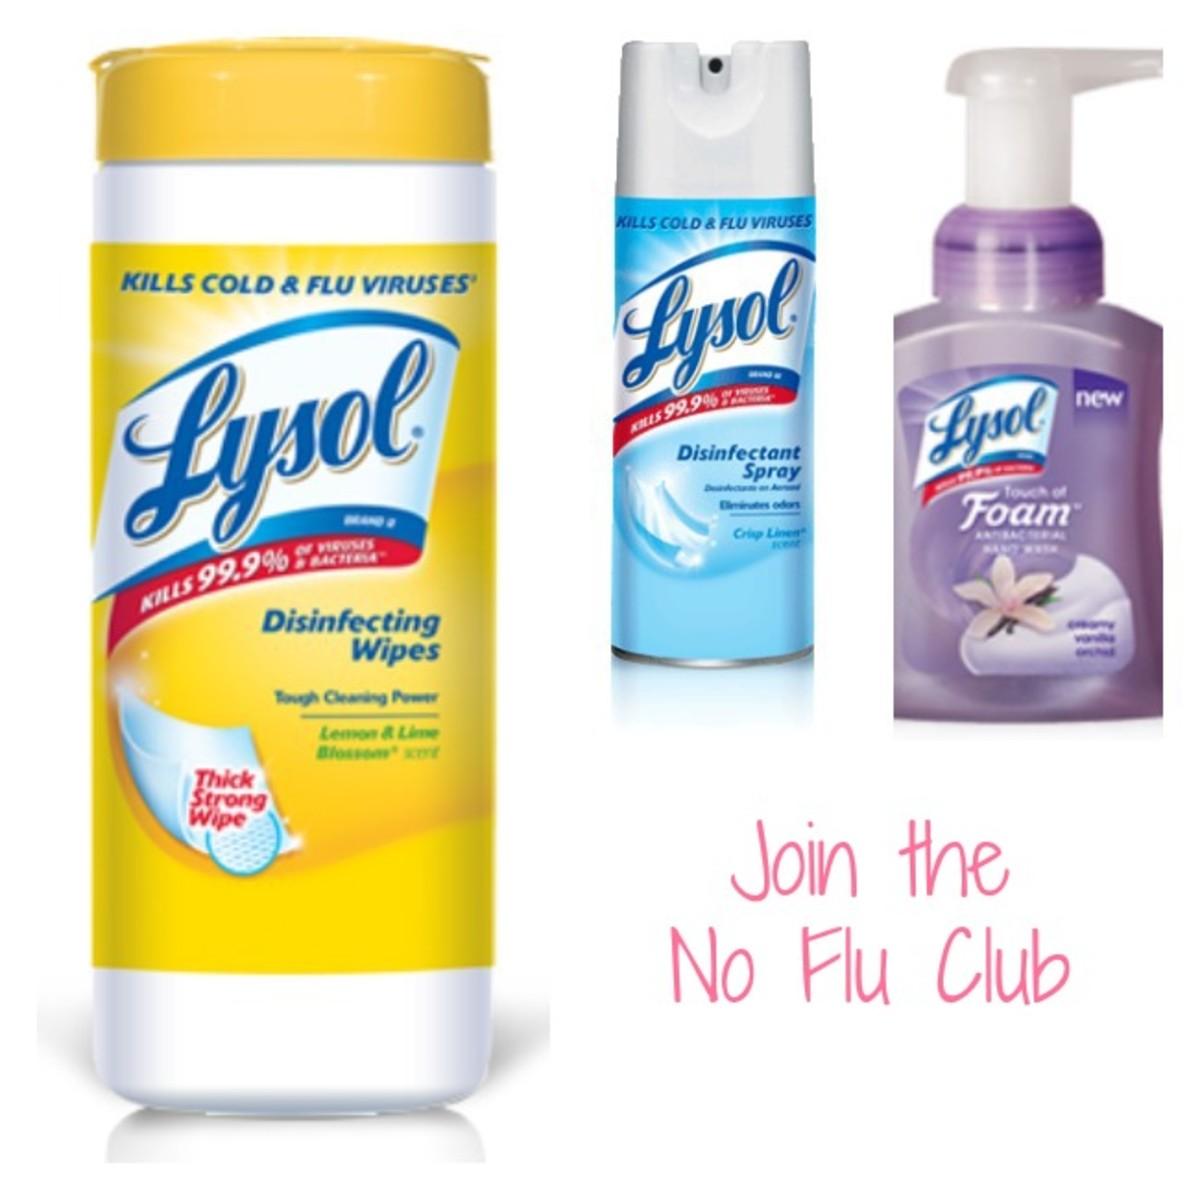 No Flu Club